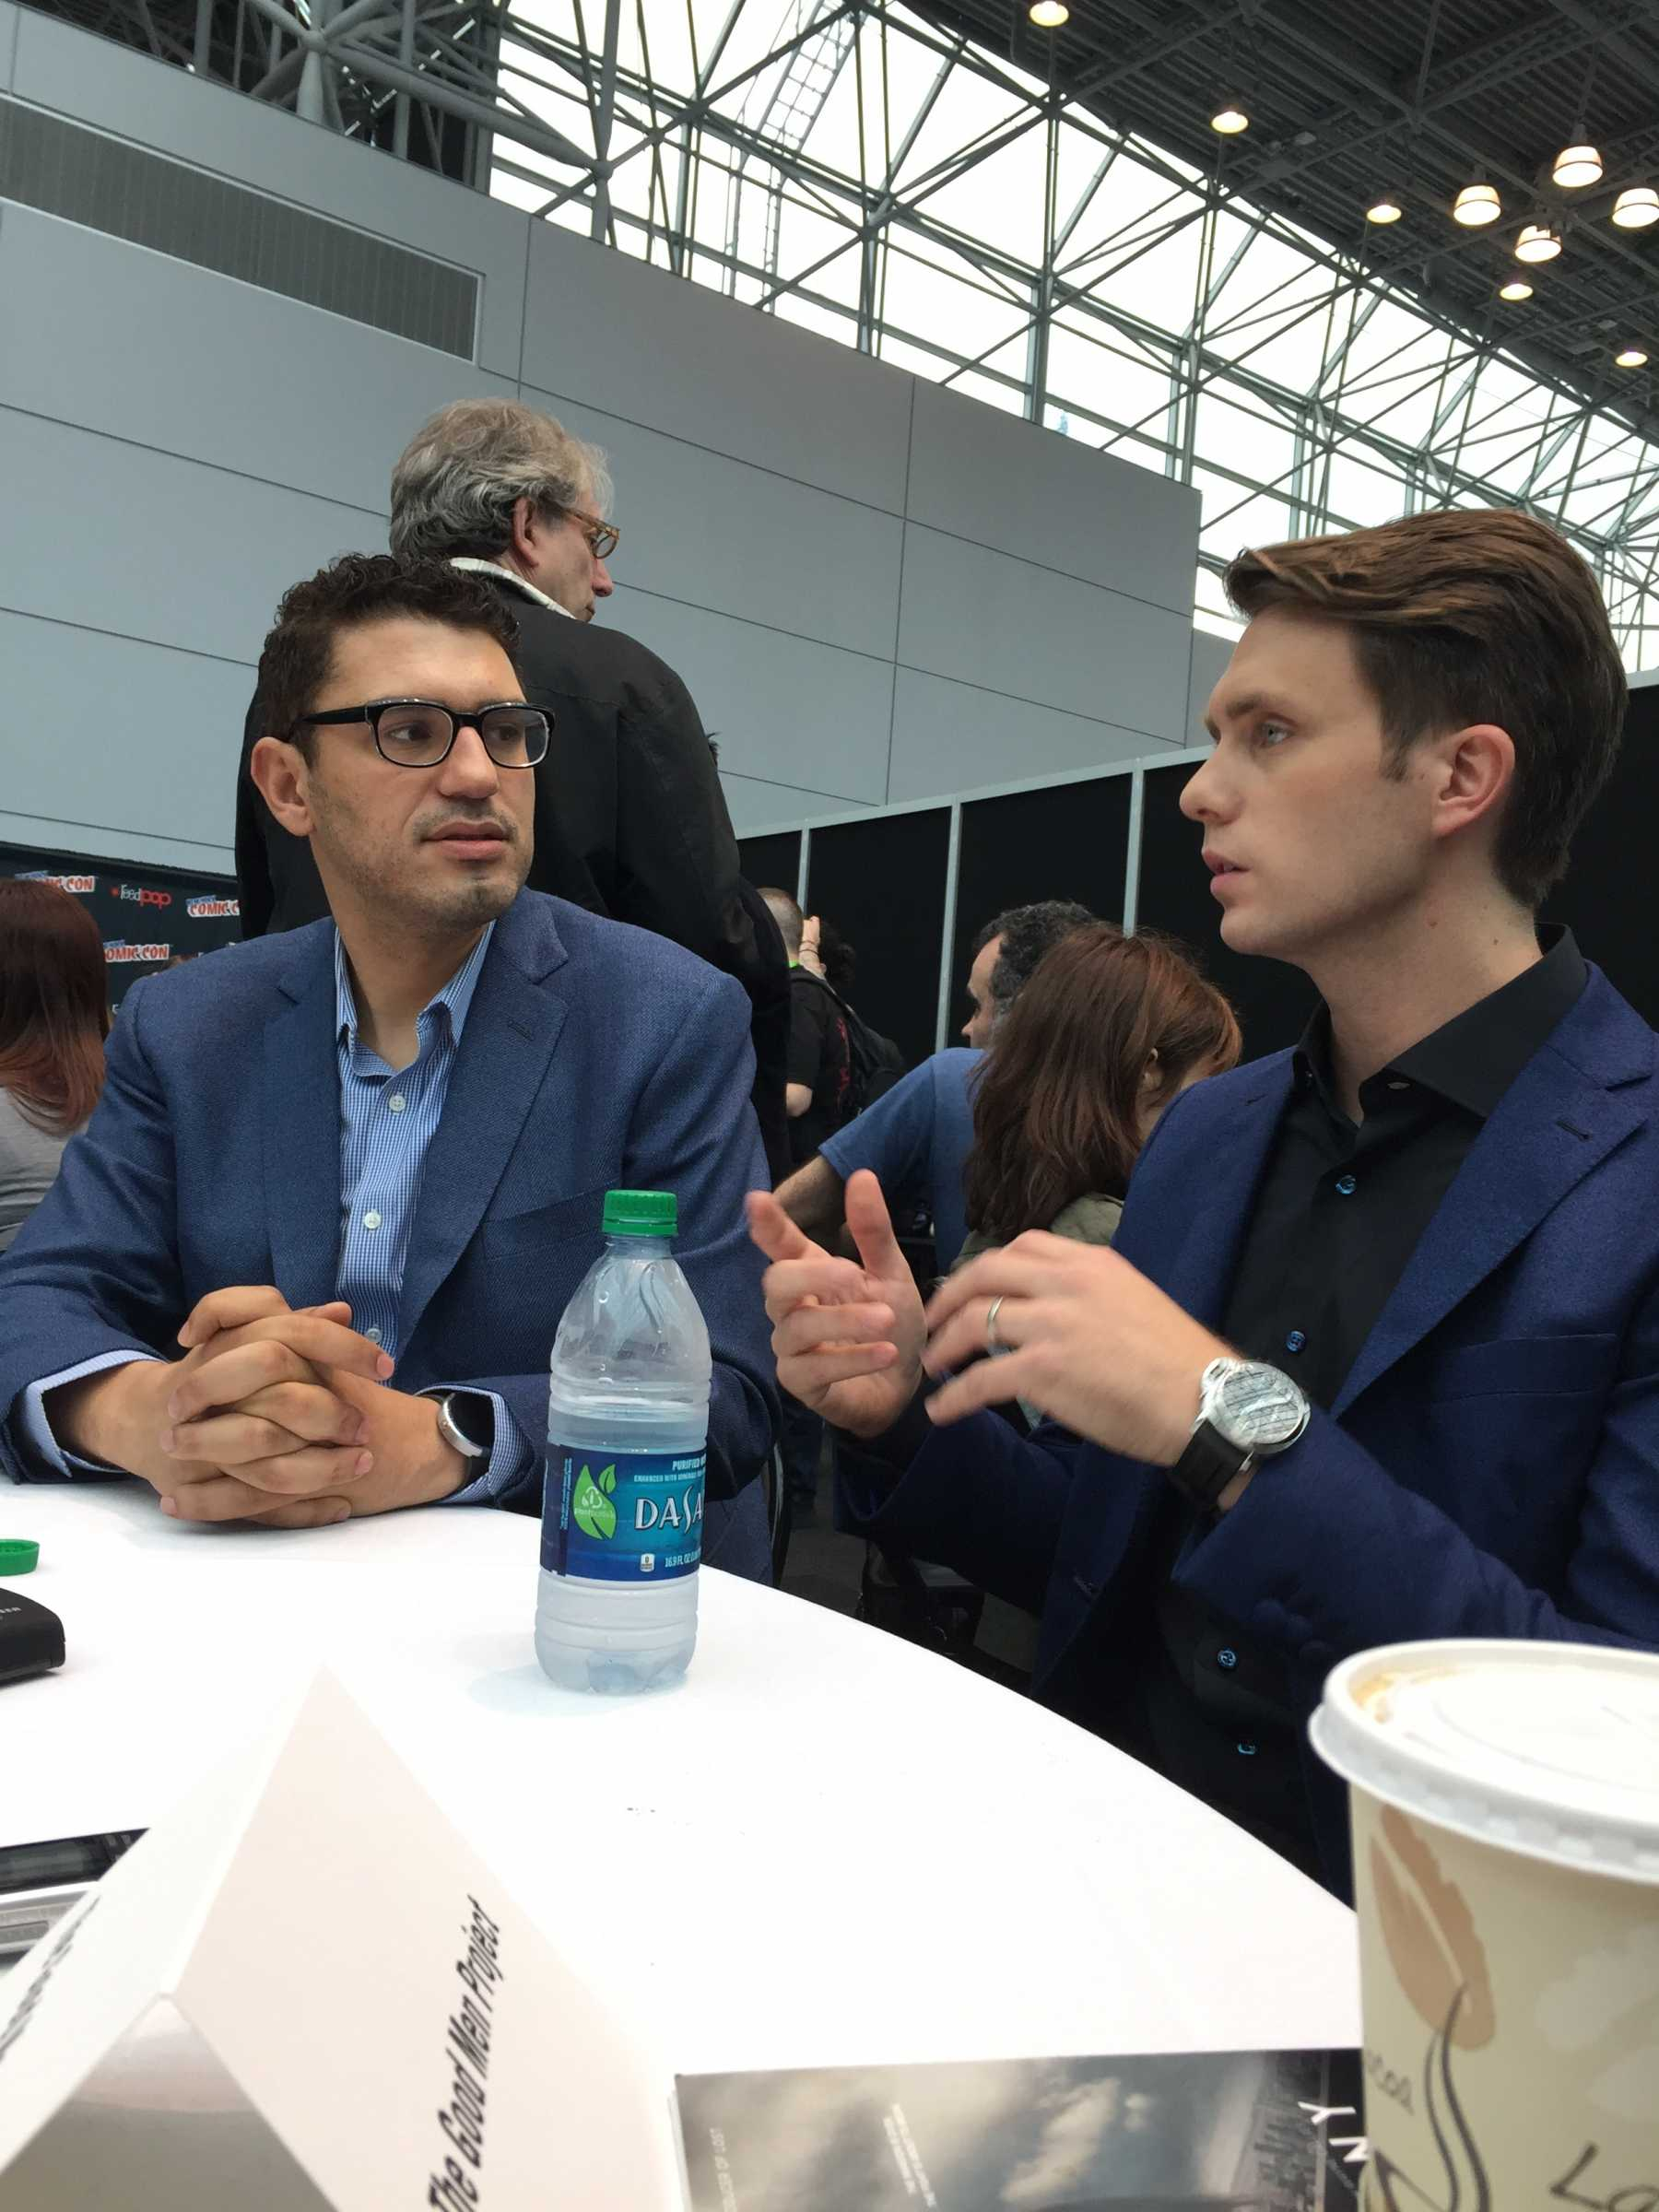 Sam Esmail & Martin Wallstrom Explain Why Mr. Robot Is The